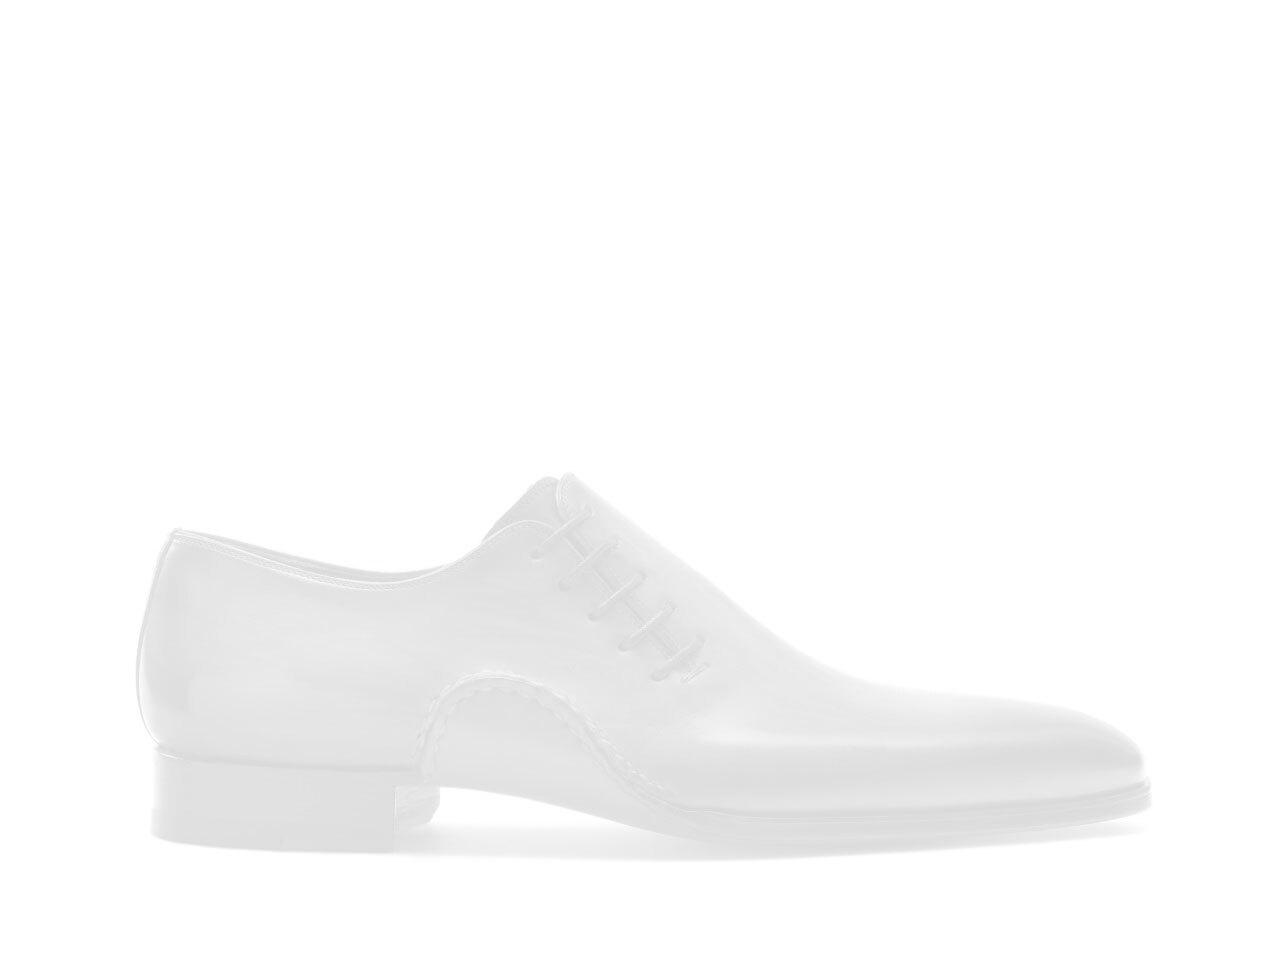 Pair of the Magnanni Nico Grey Men's Sneakers